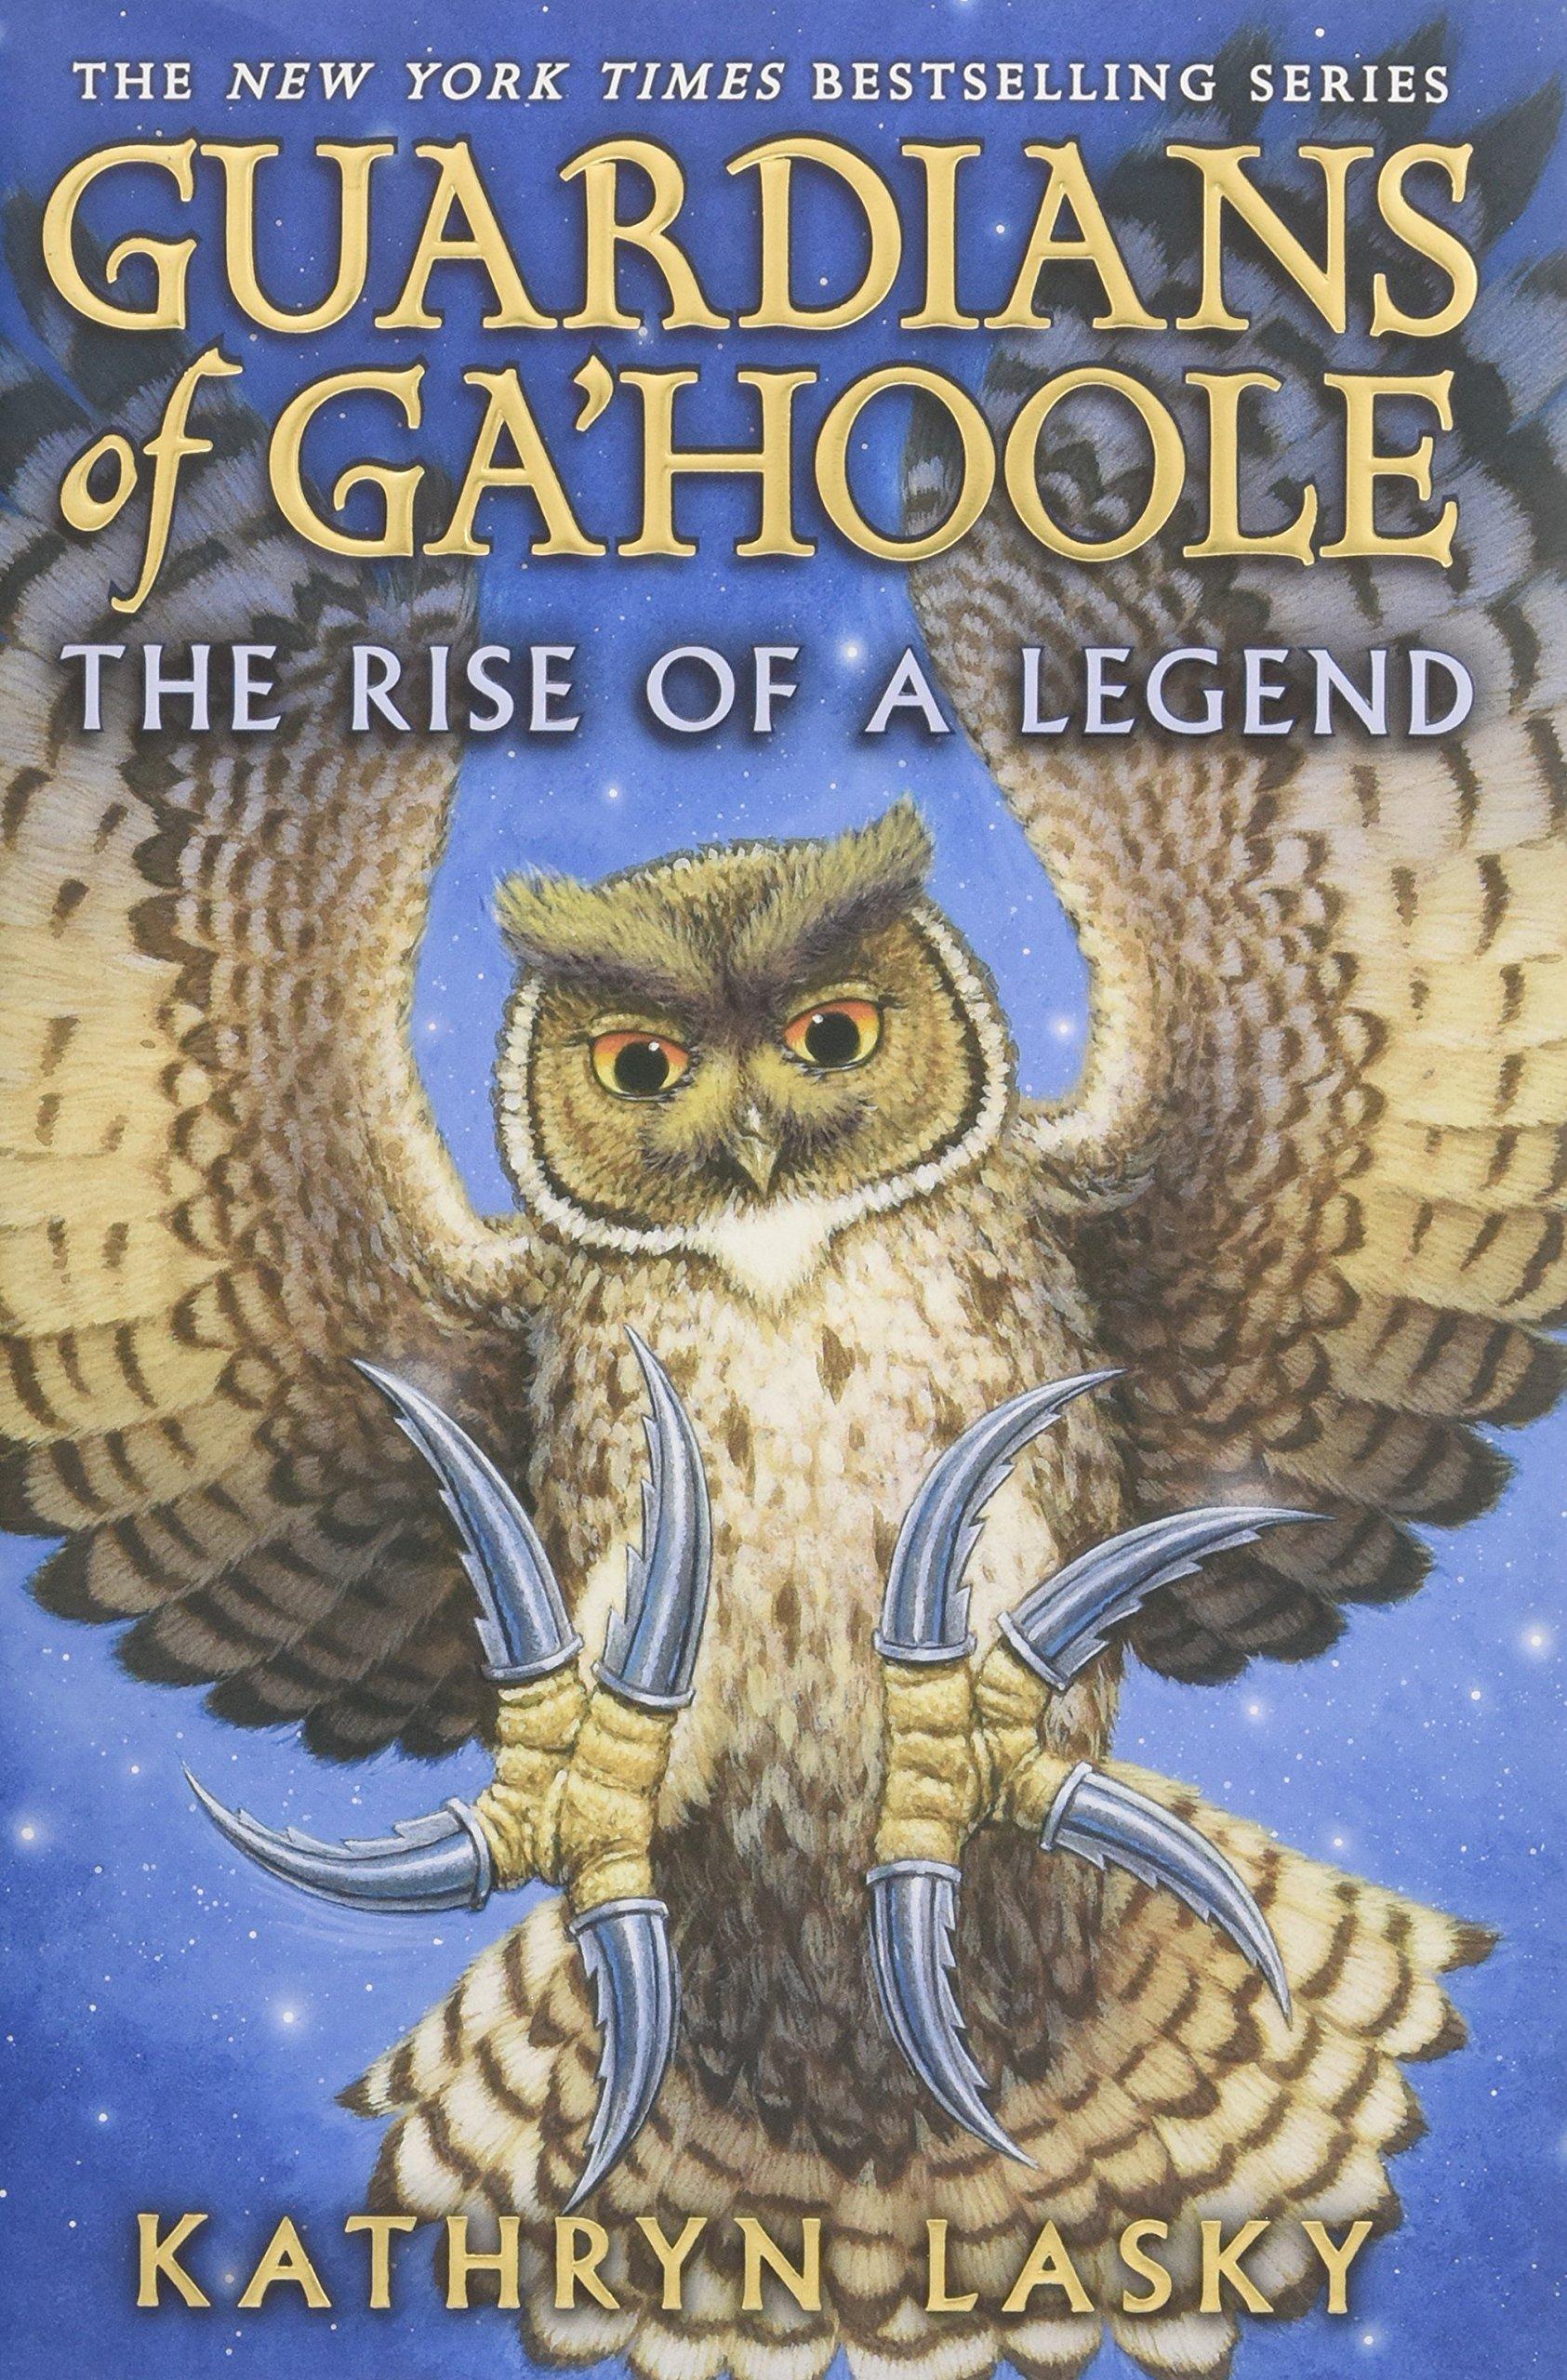 Guardians of Ga'Hoole: The Rise of a Legend ebook